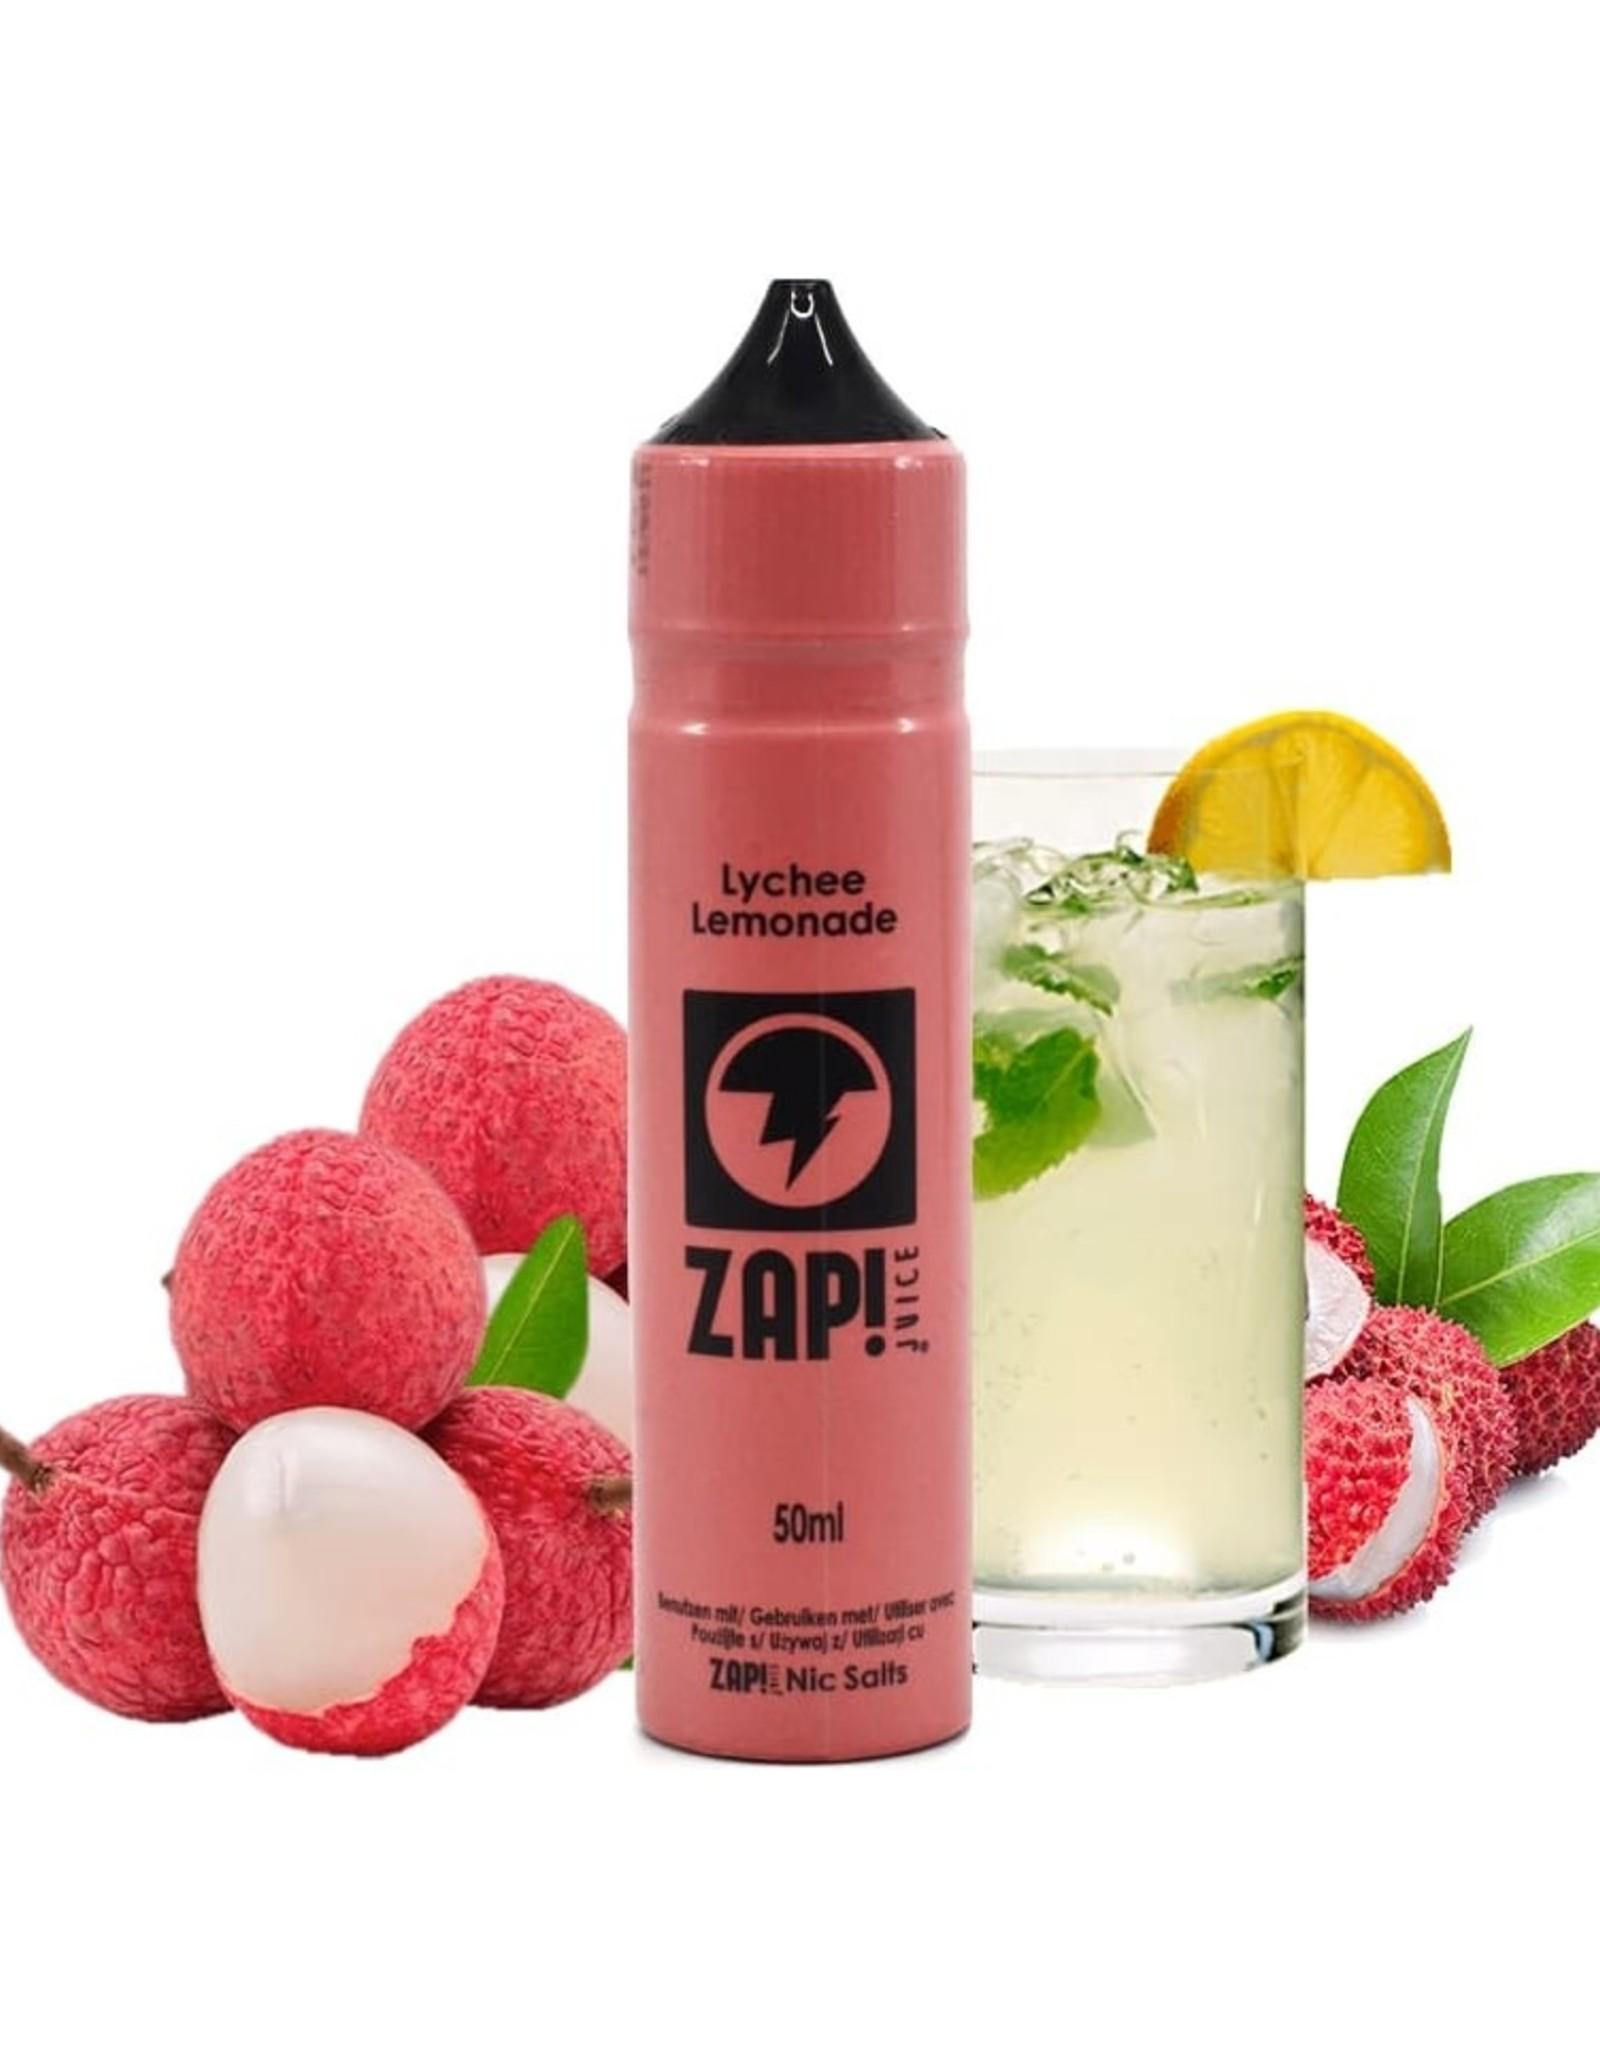 ZAP! ZAP - Lychee Limonade 50ml